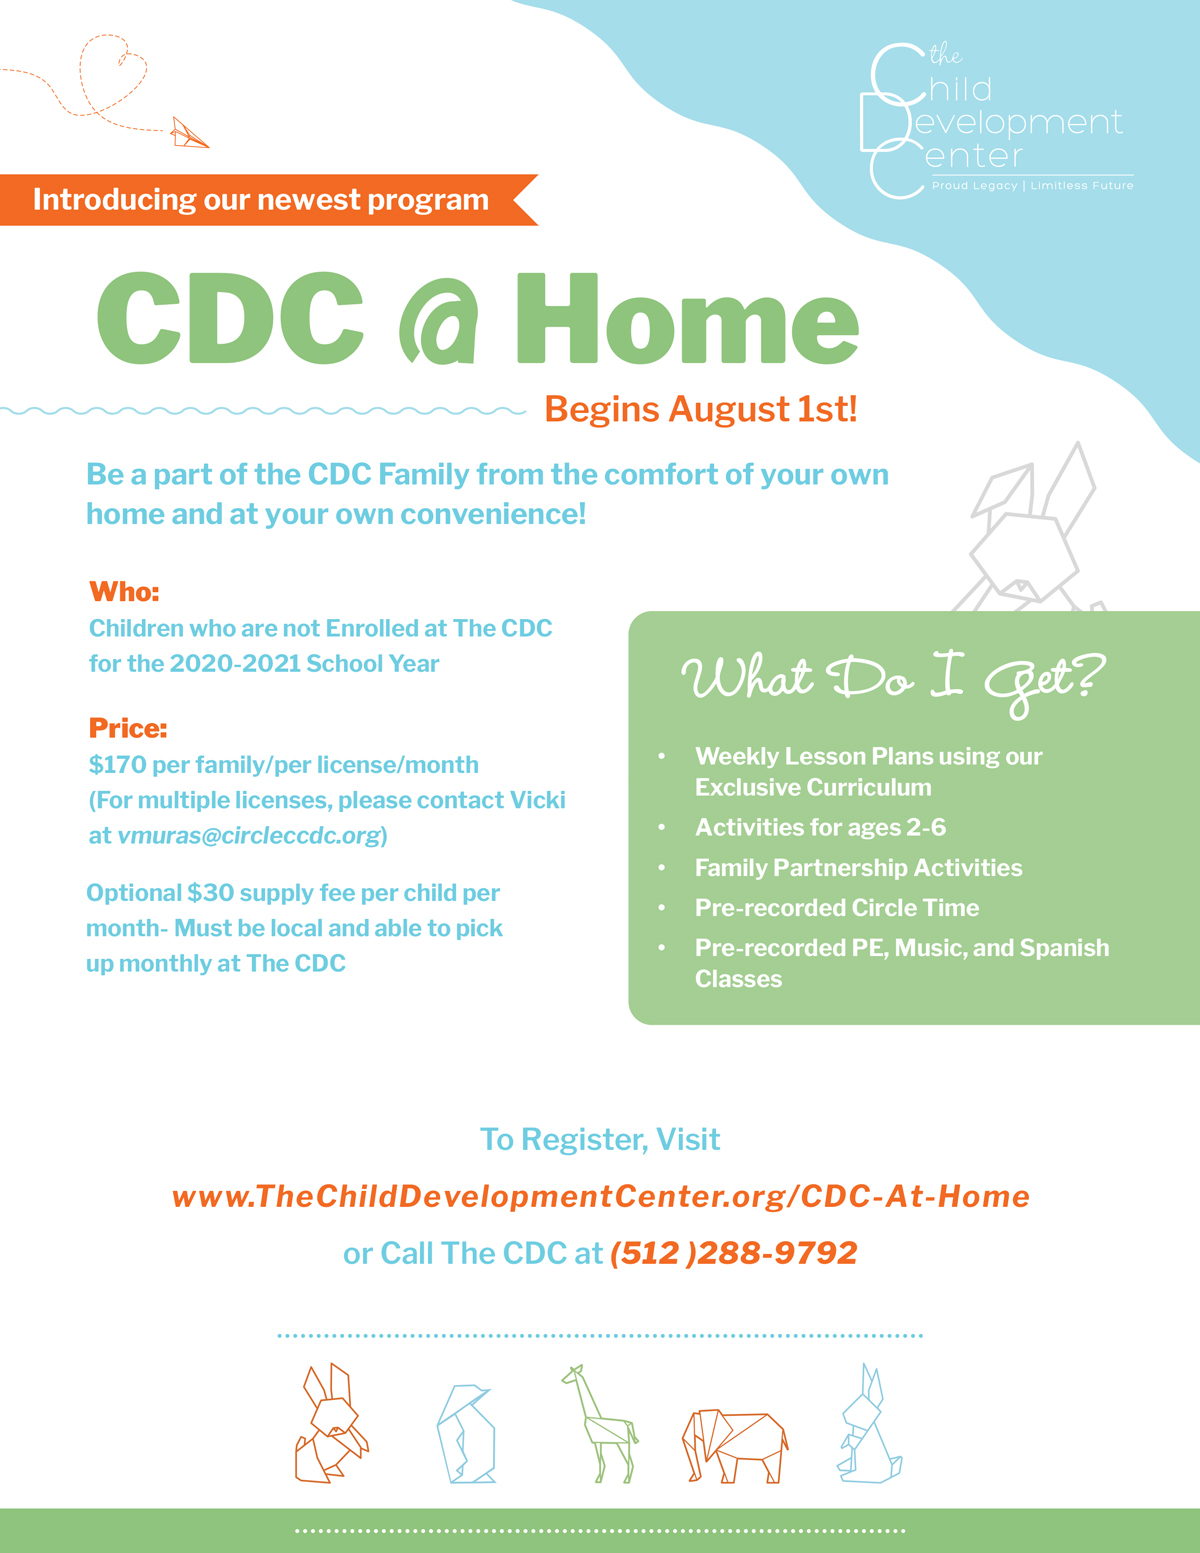 CDC@HOME